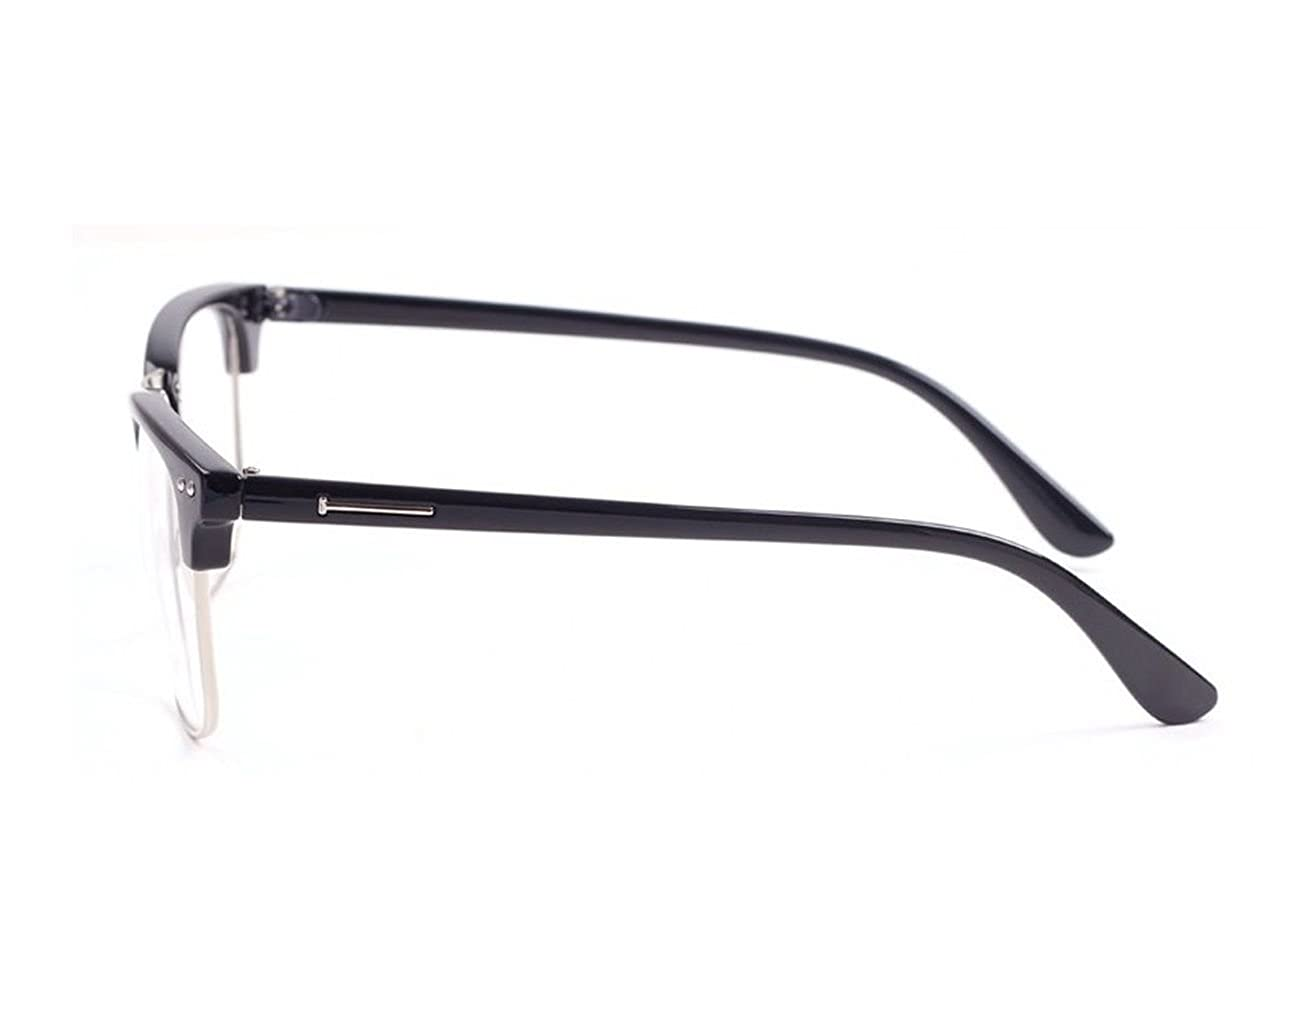 Mens Womens Original Retro glasses CLEAR LENS Unisex Vintage Cat Eye style Party